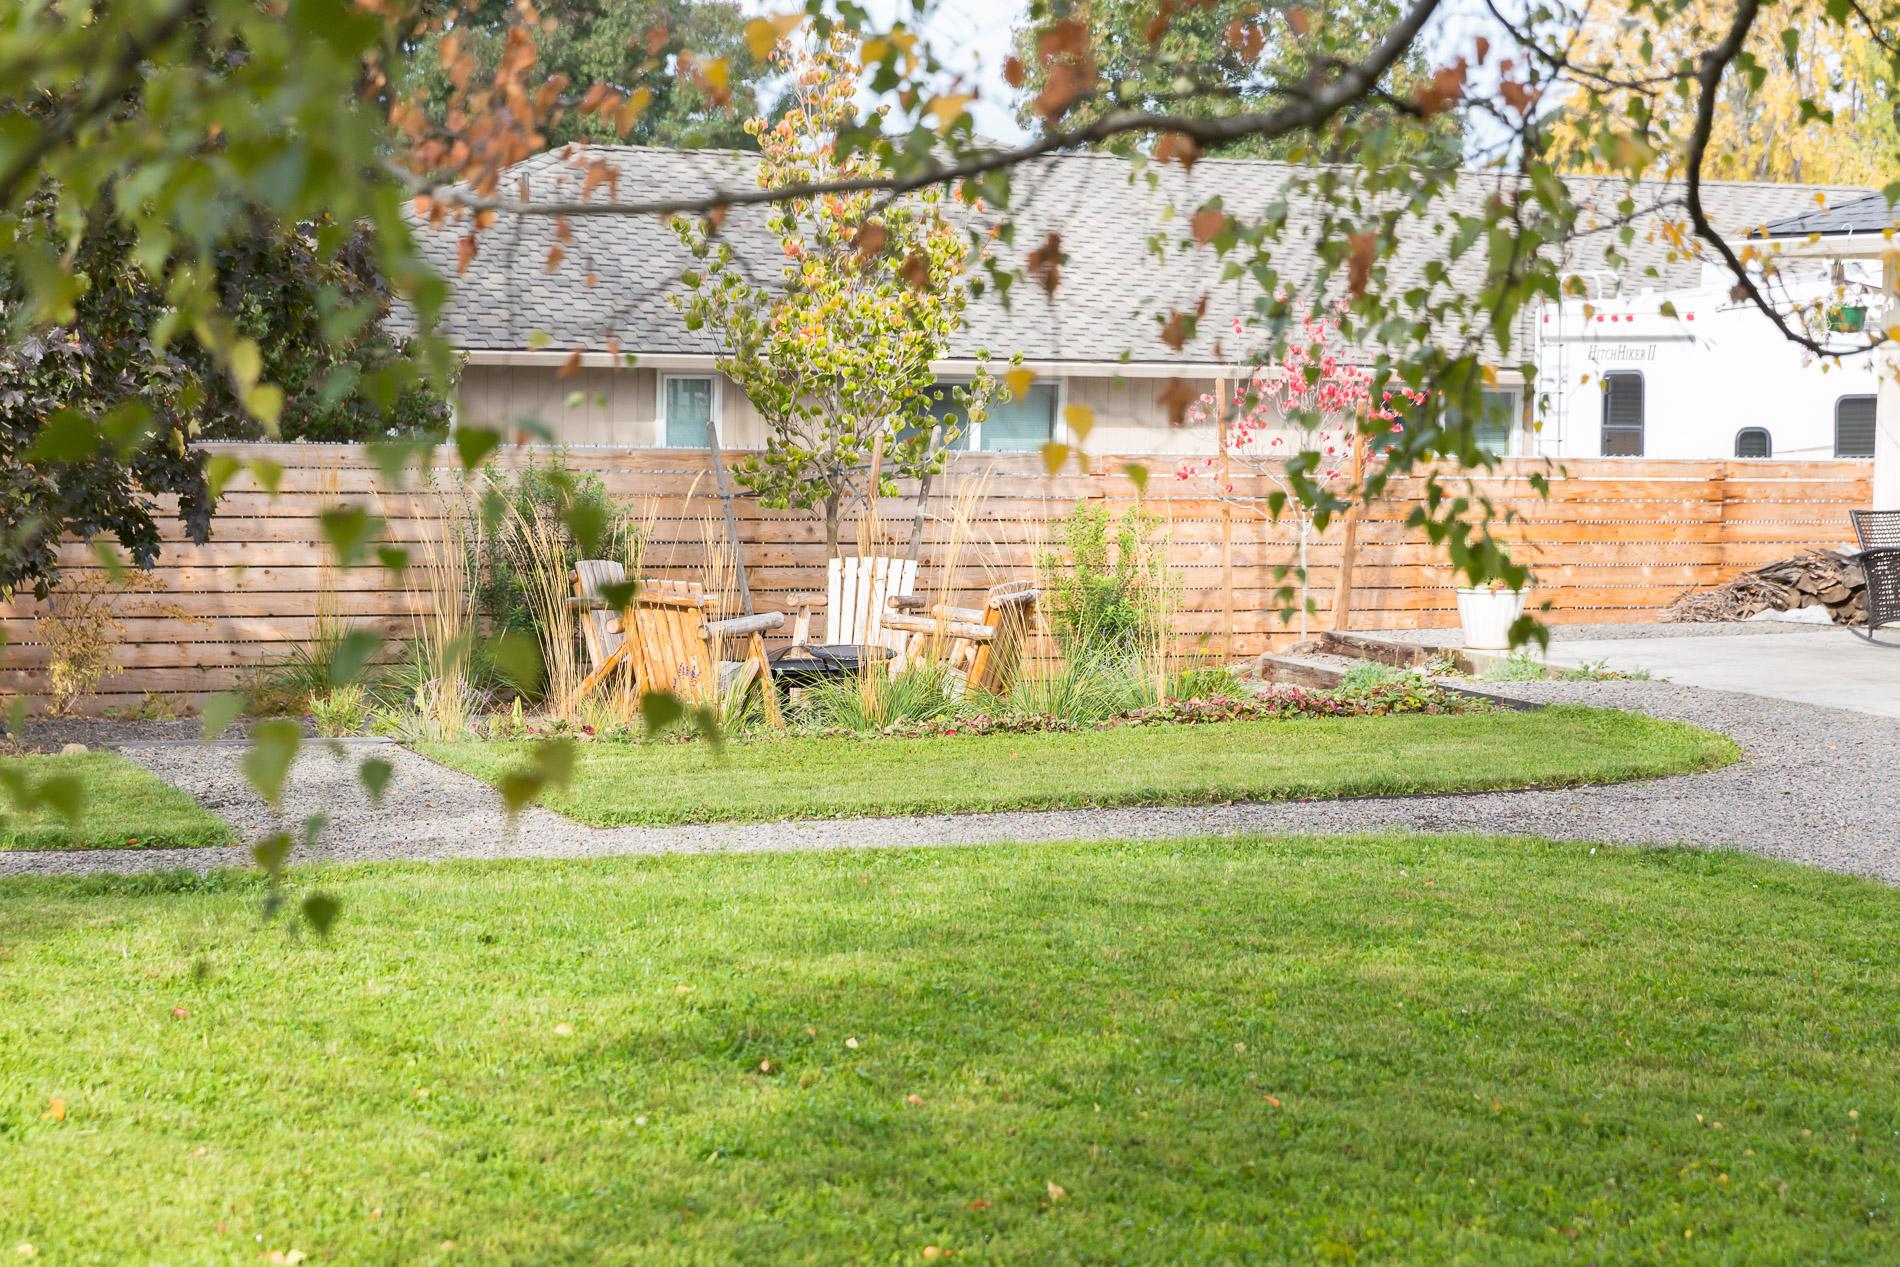 Eco-Lawn + Alternative Lawn + Gravel Pathways